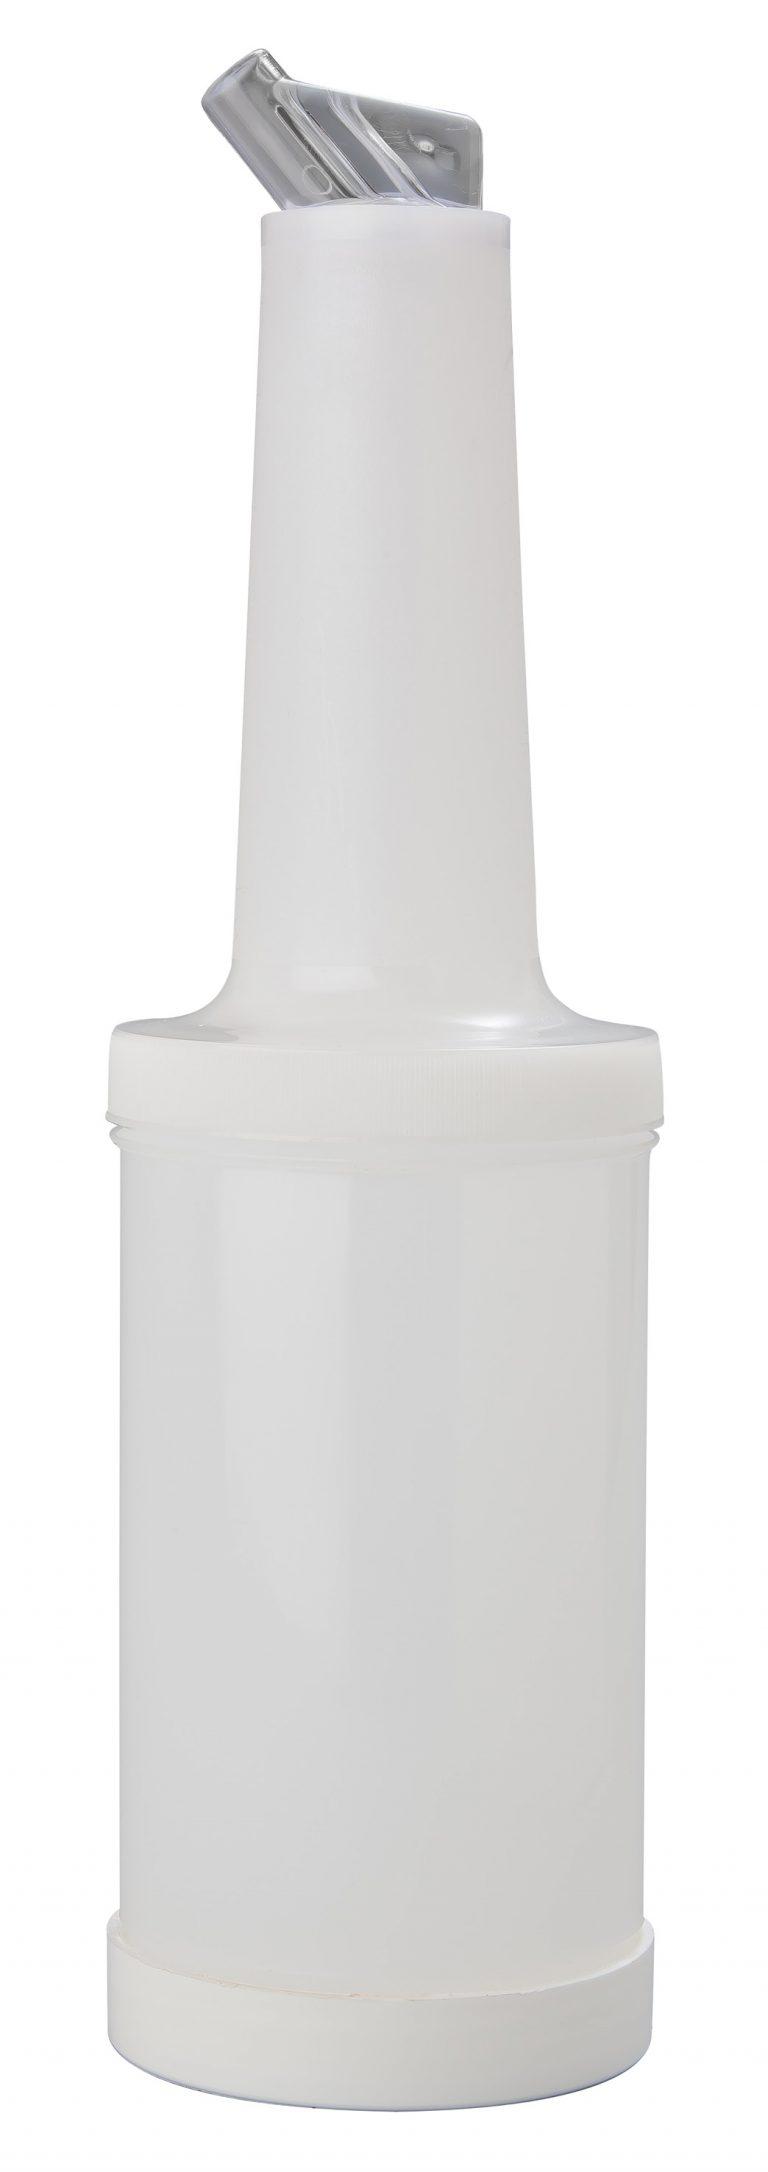 Save & Pour Bottle - White